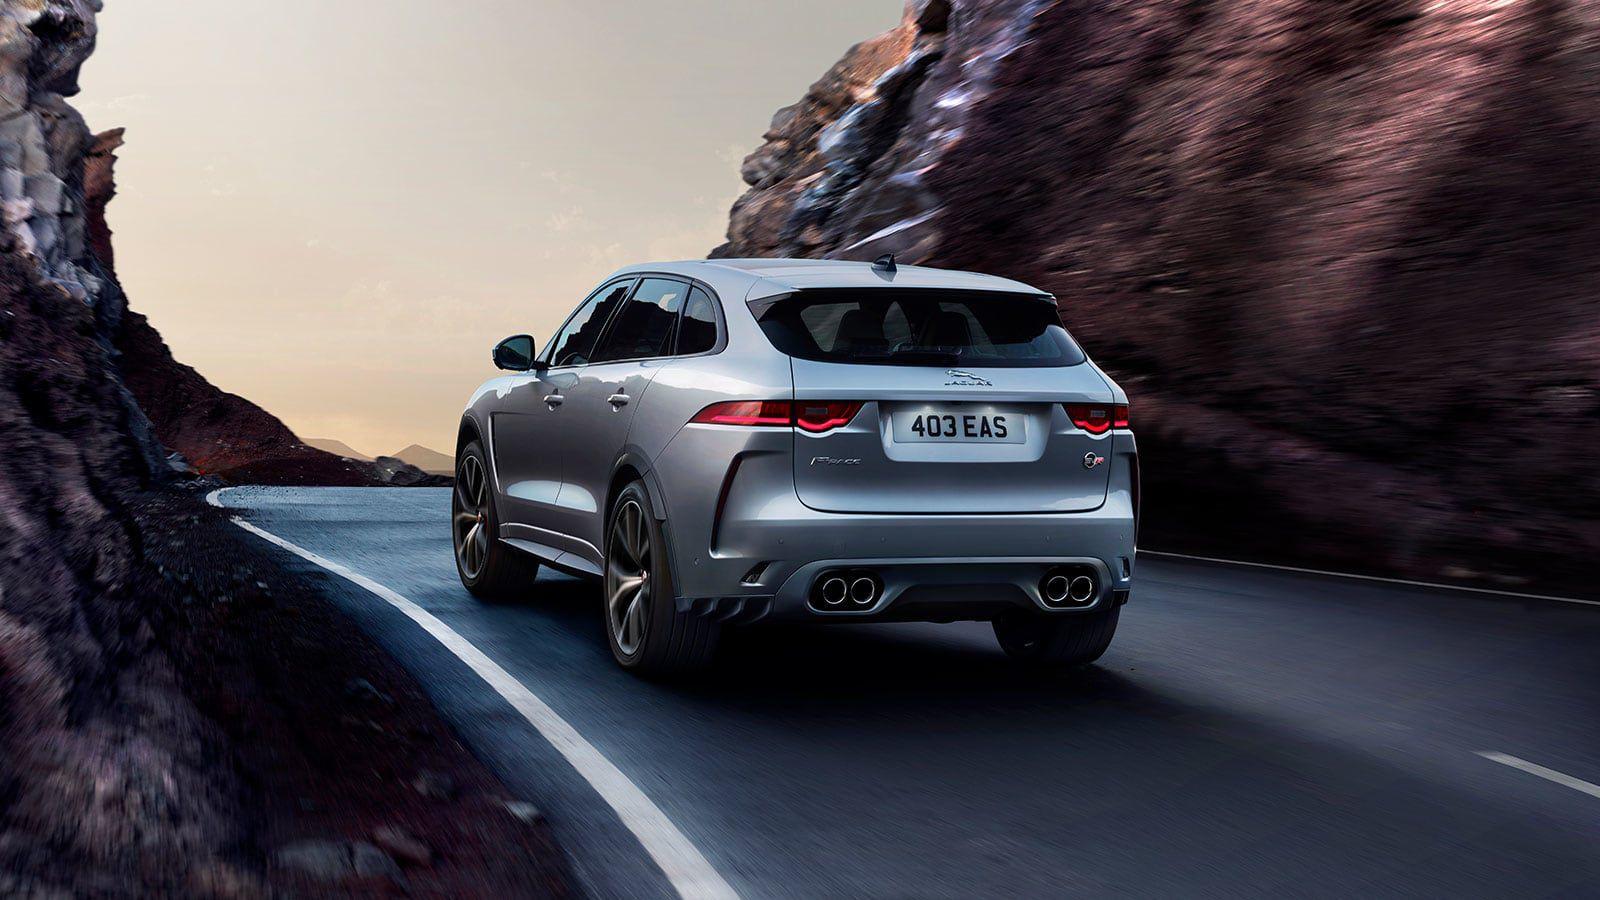 Jaguar F-PACE | Resumen | Prestaciones SUV | Jaguar Chile